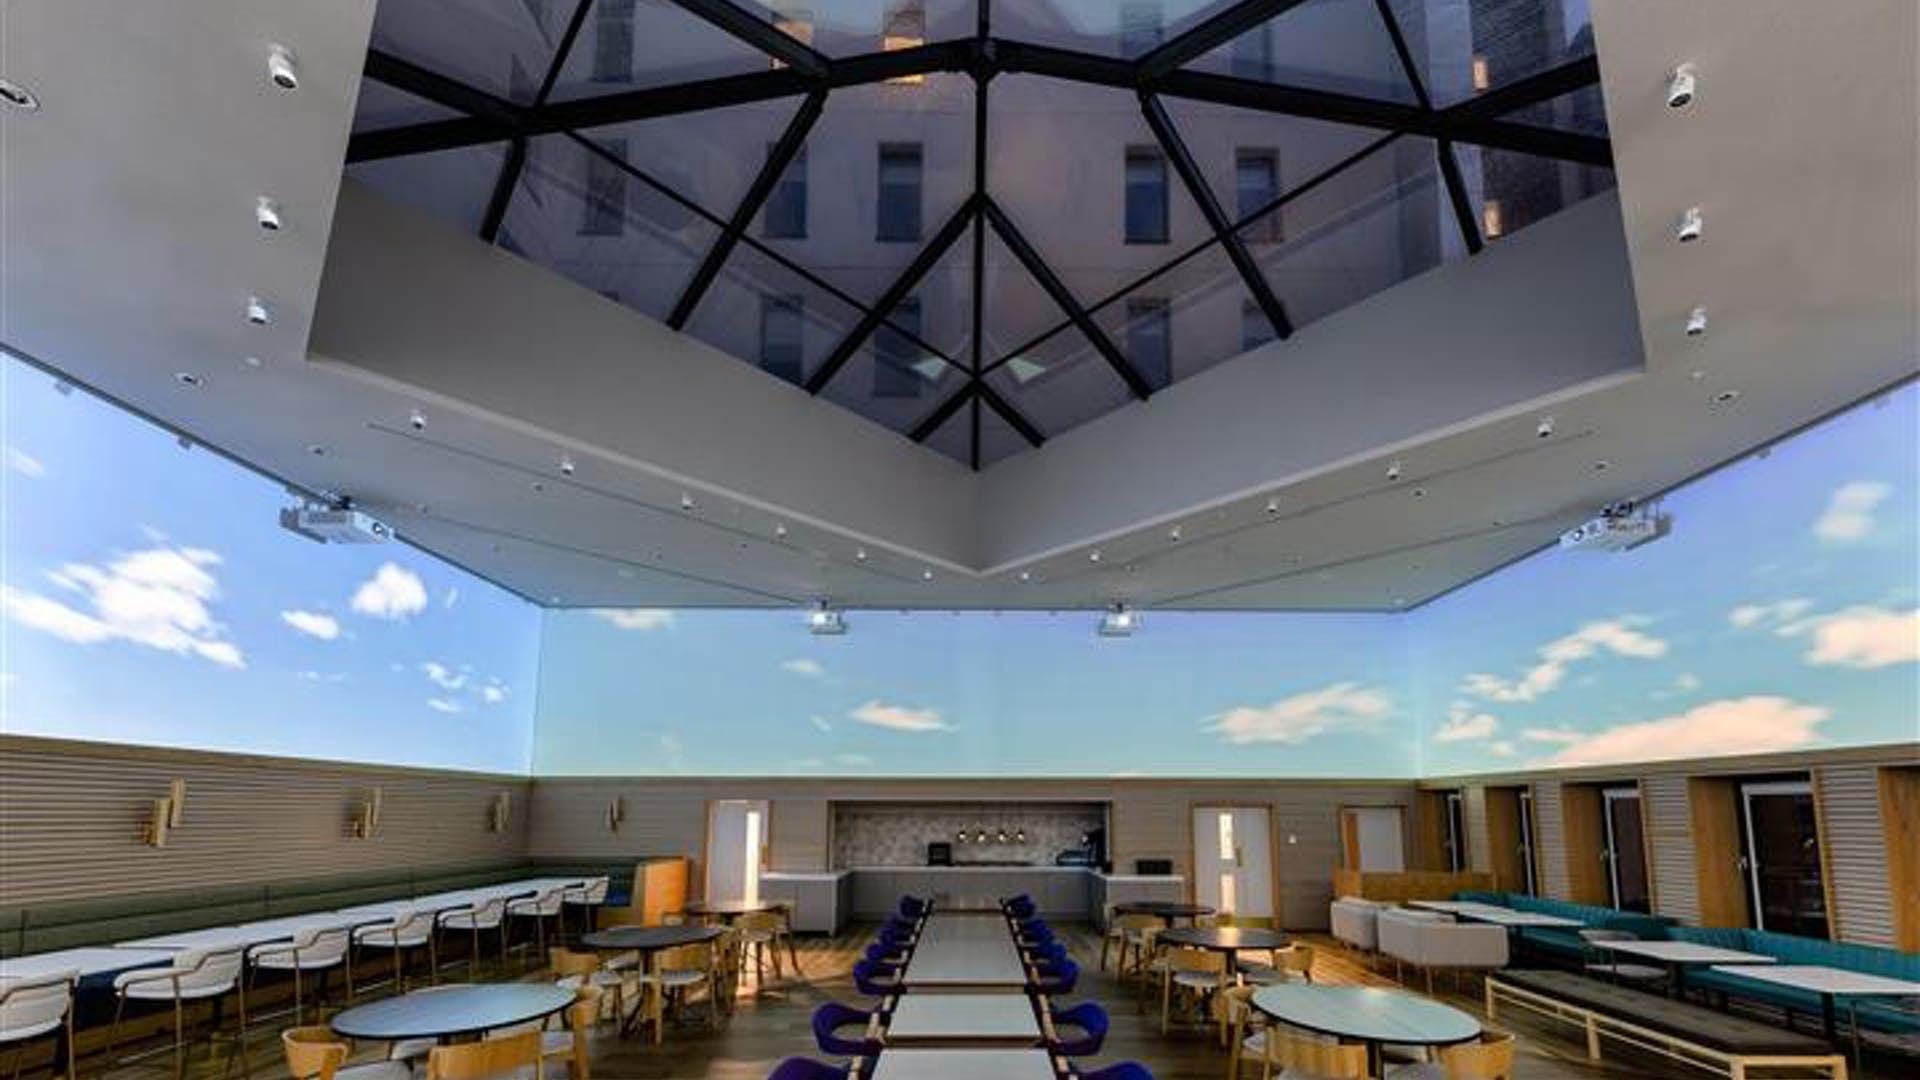 Imaginex 360° Screening Room at Yotel Edinburgh